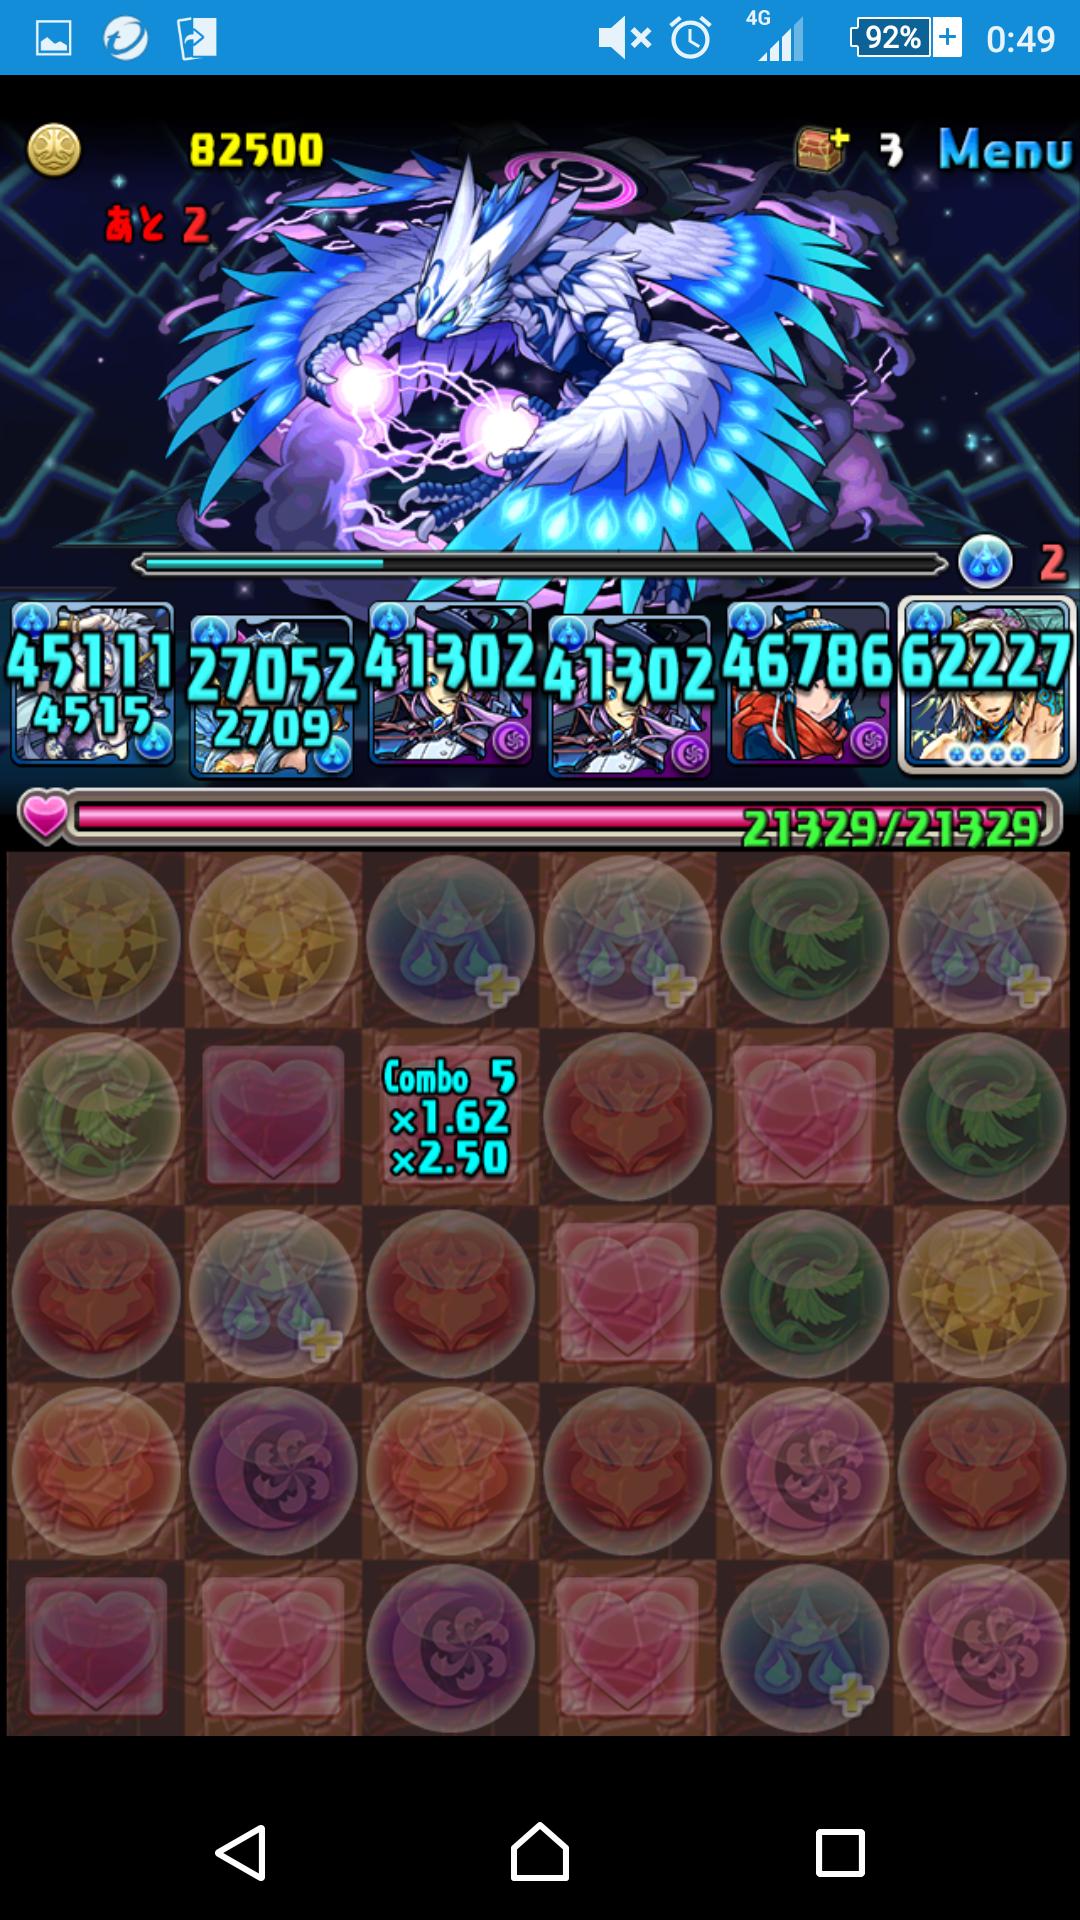 Screenshot_2016-05-16-00-49-14.png